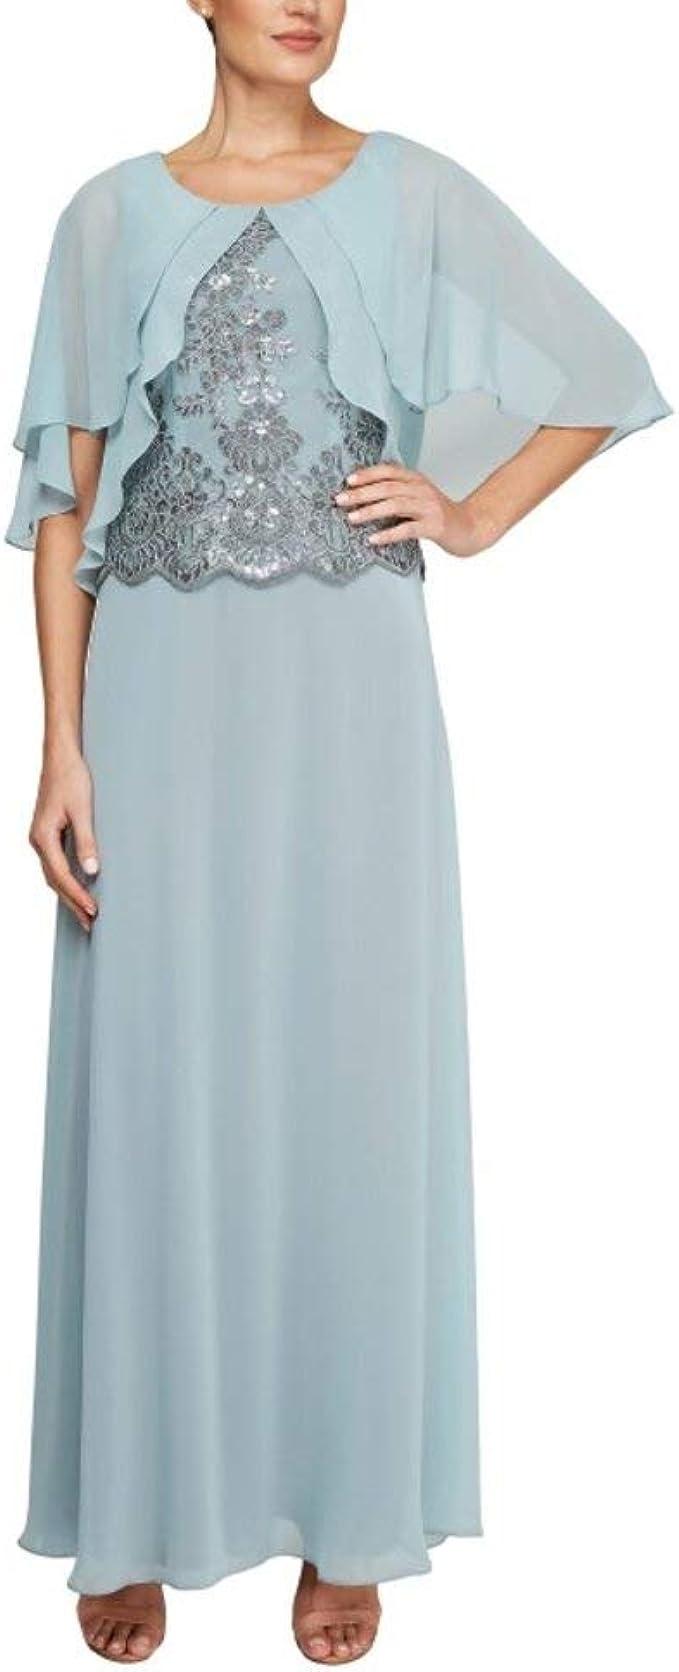 Le Bos Damen Capelet Embroidered Long Dress Kleid für besondere